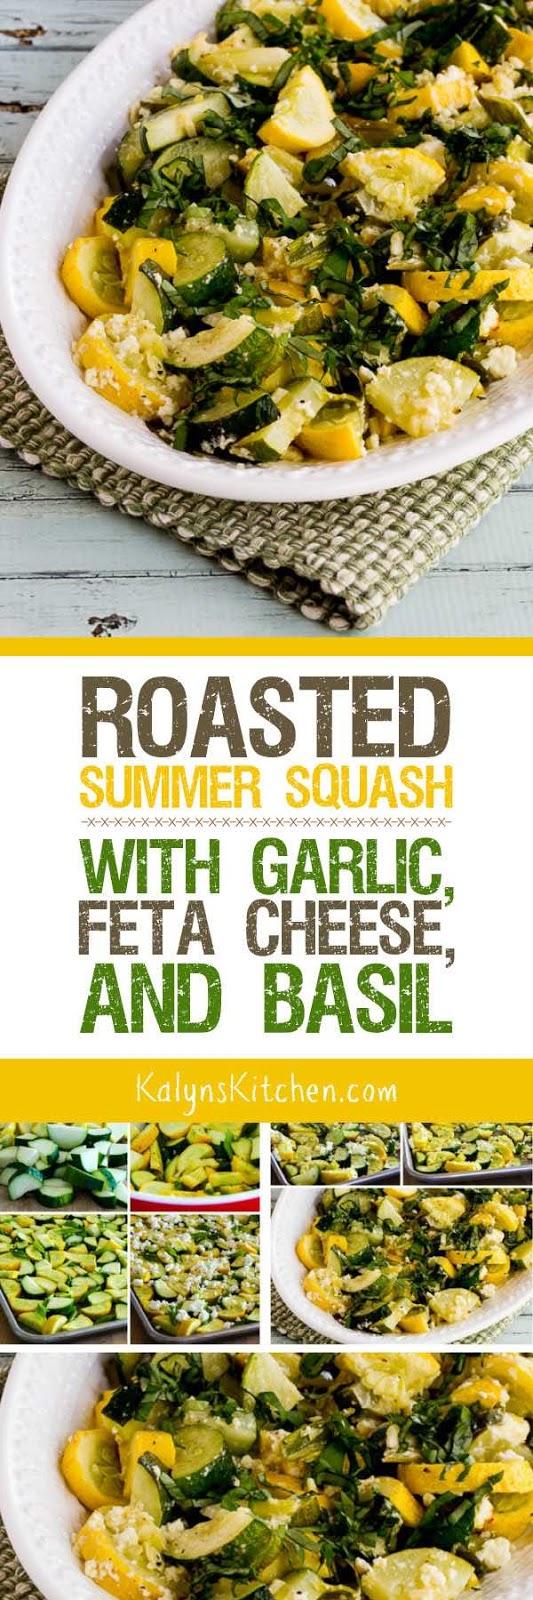 ... Kitchen®: Roasted Summer Squash with Garlic, Feta Cheese, and Basil